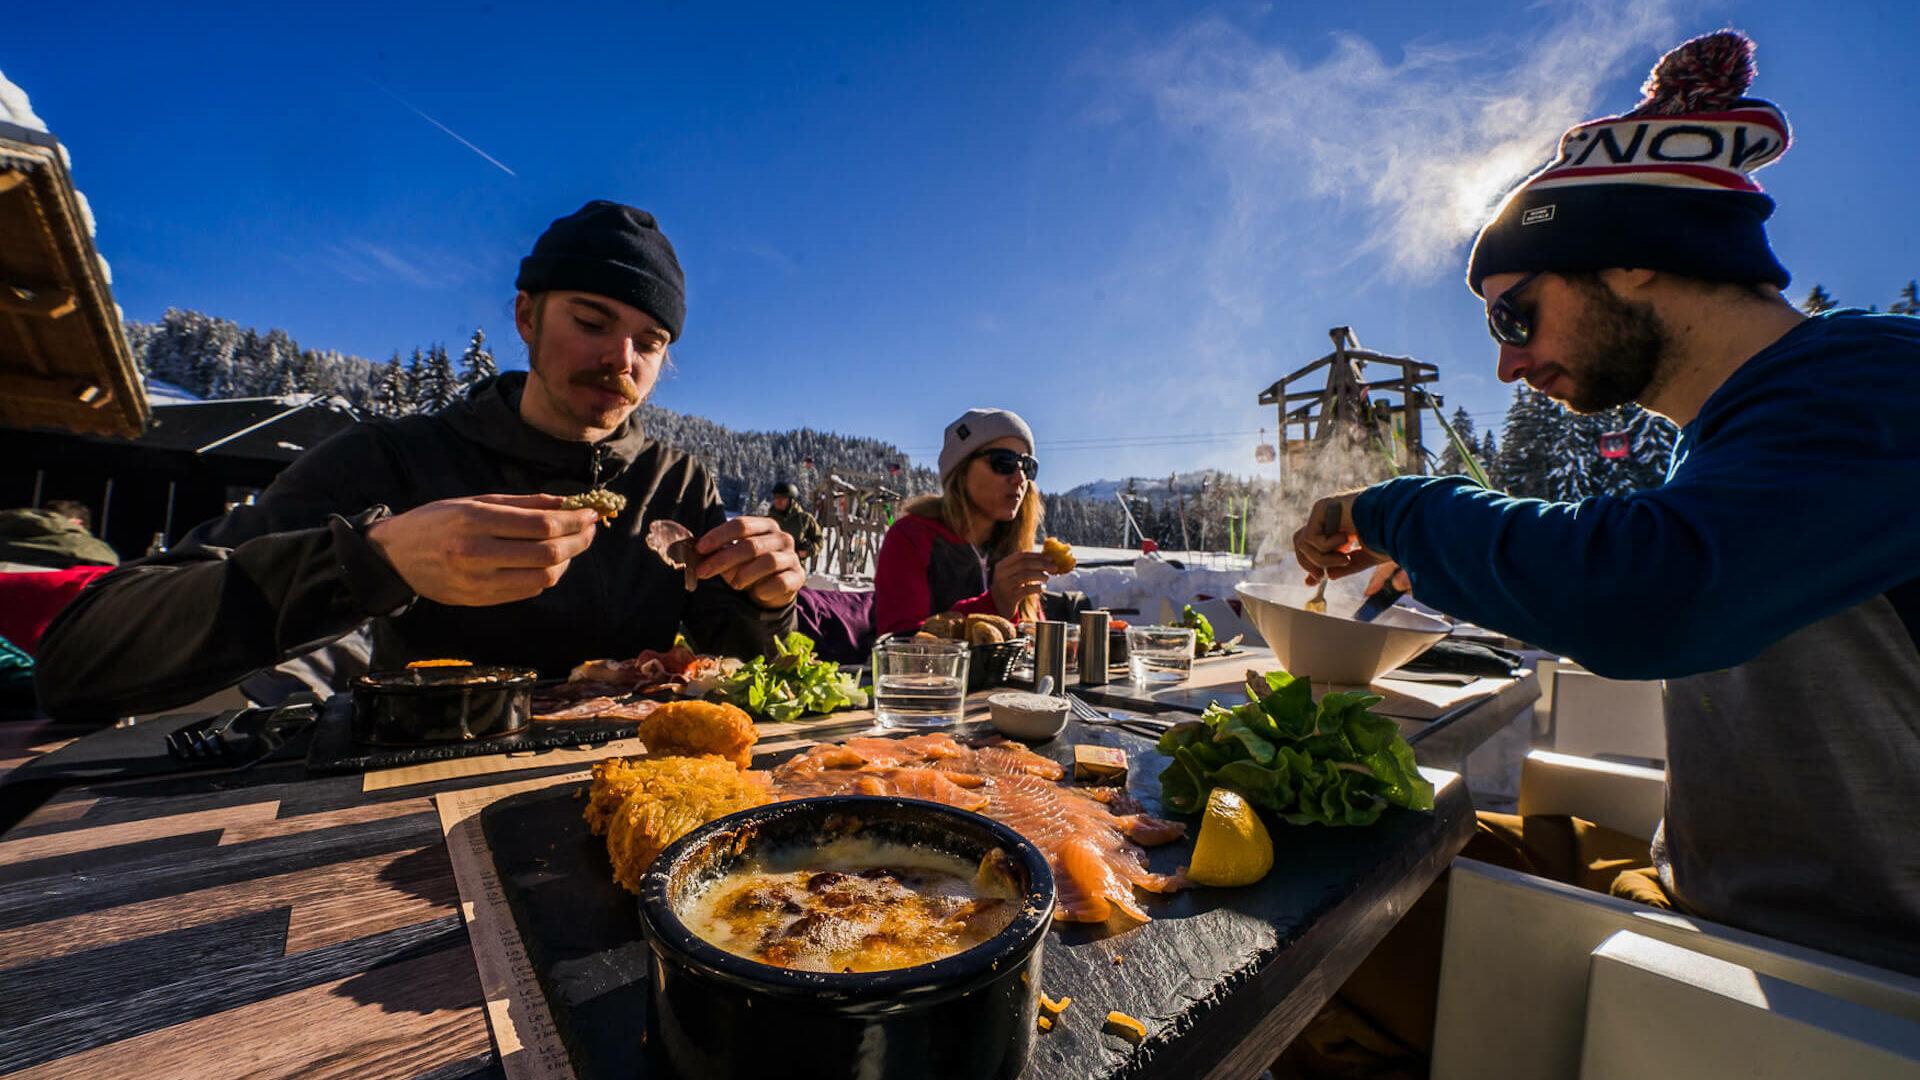 Amis prenant un repas au restaurant en terrasse en hiver